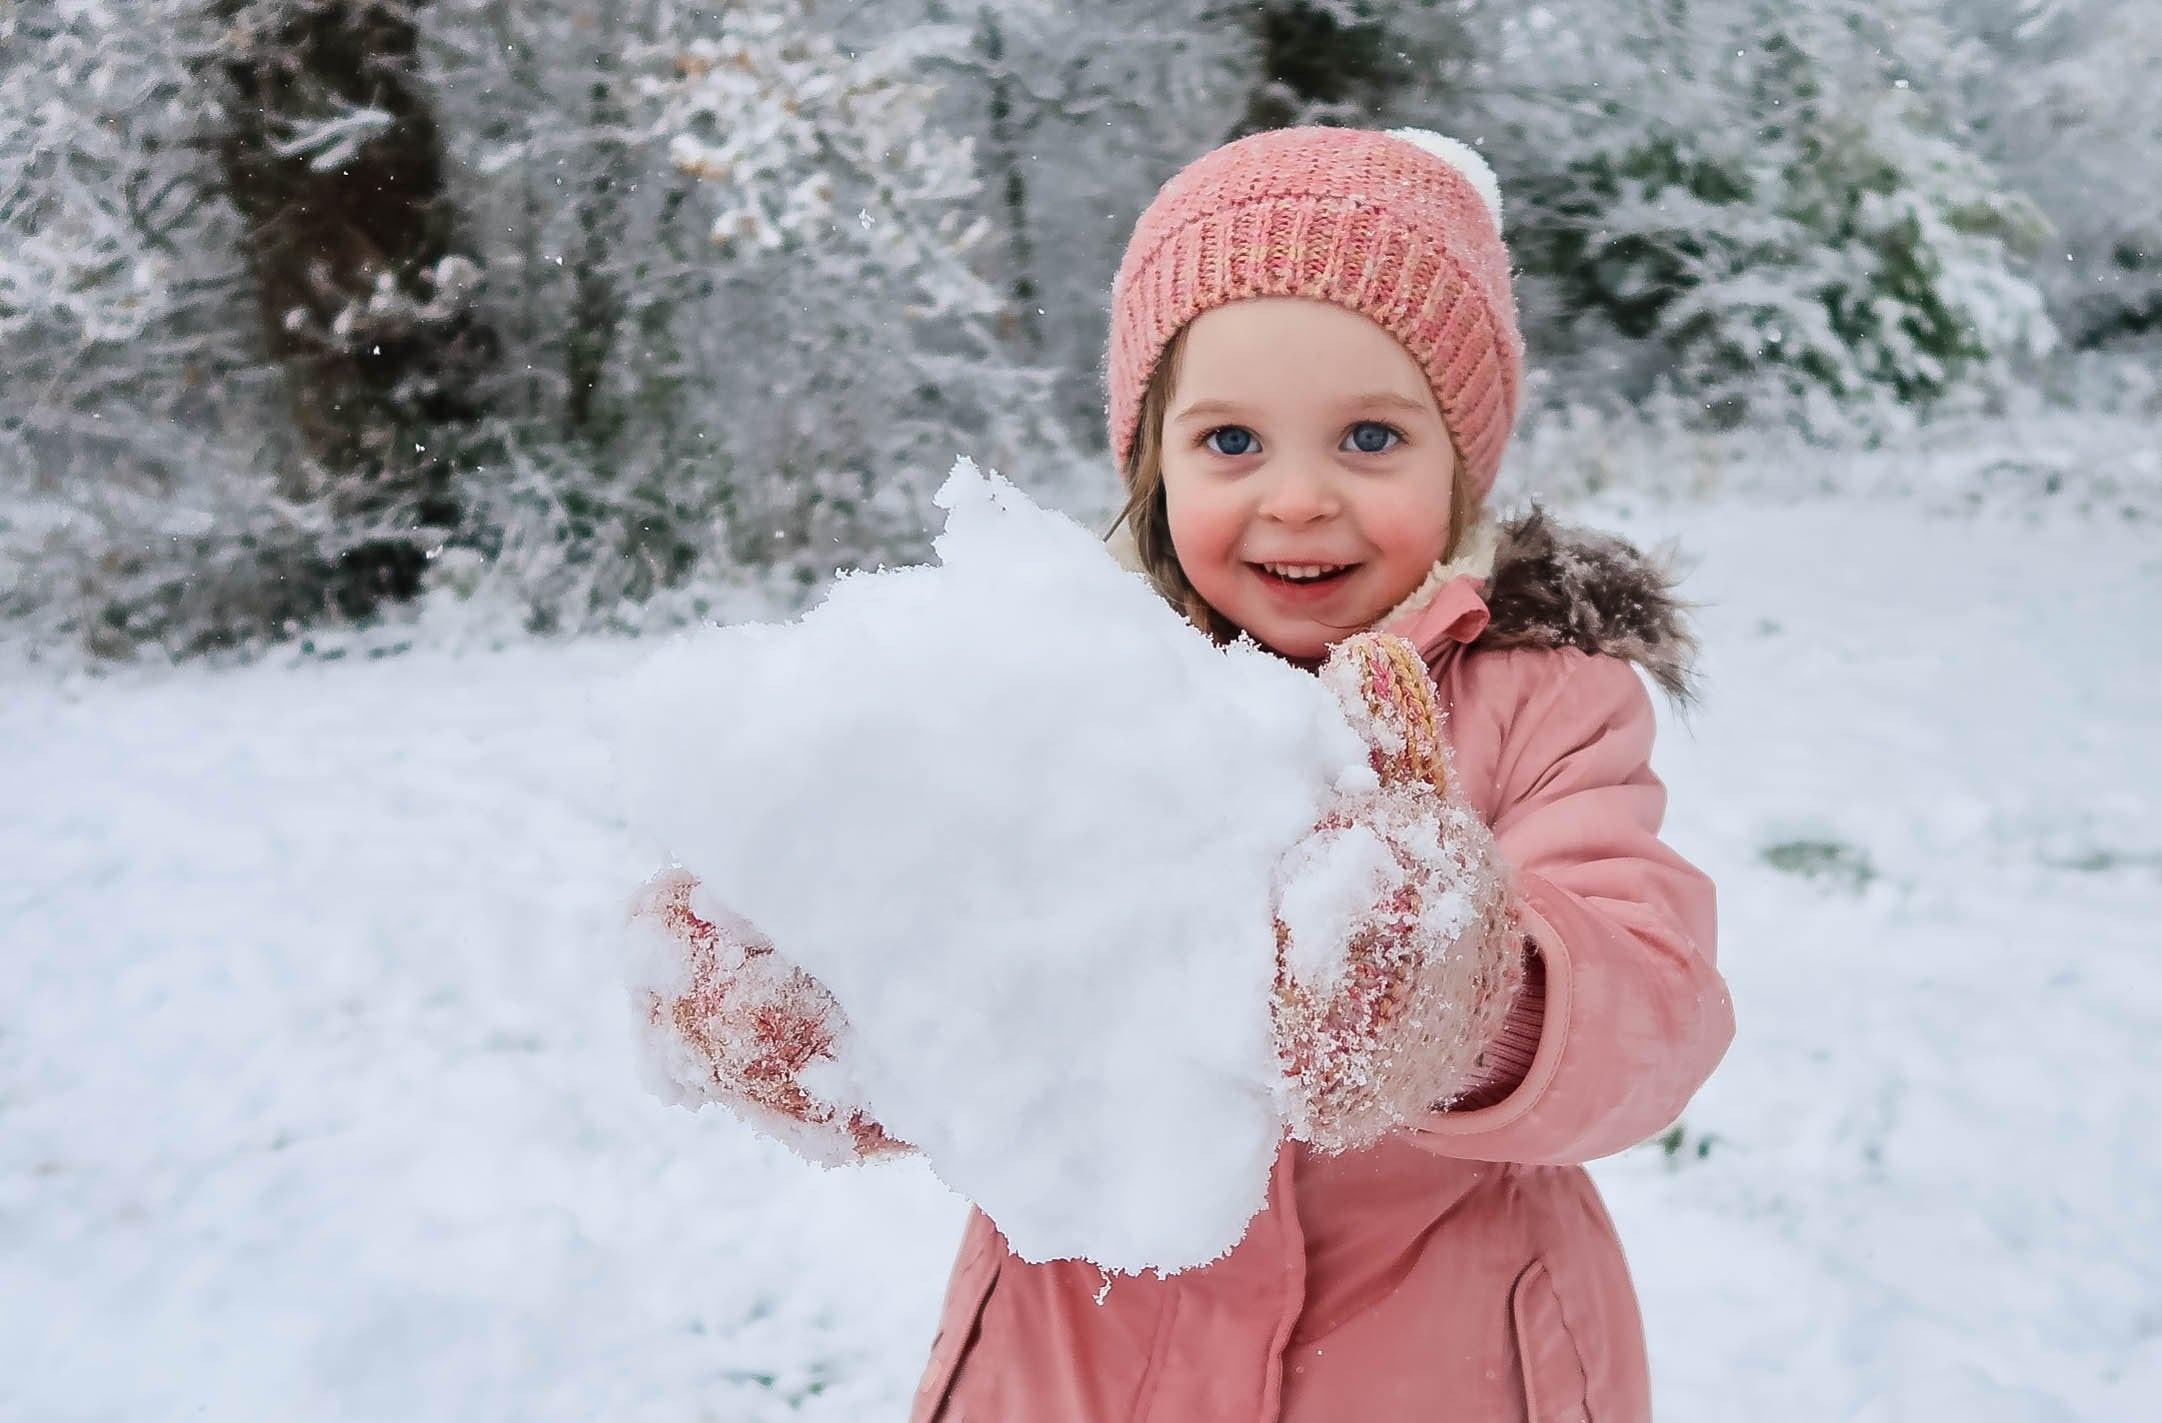 Картинки дети зима, надписями мудрыми